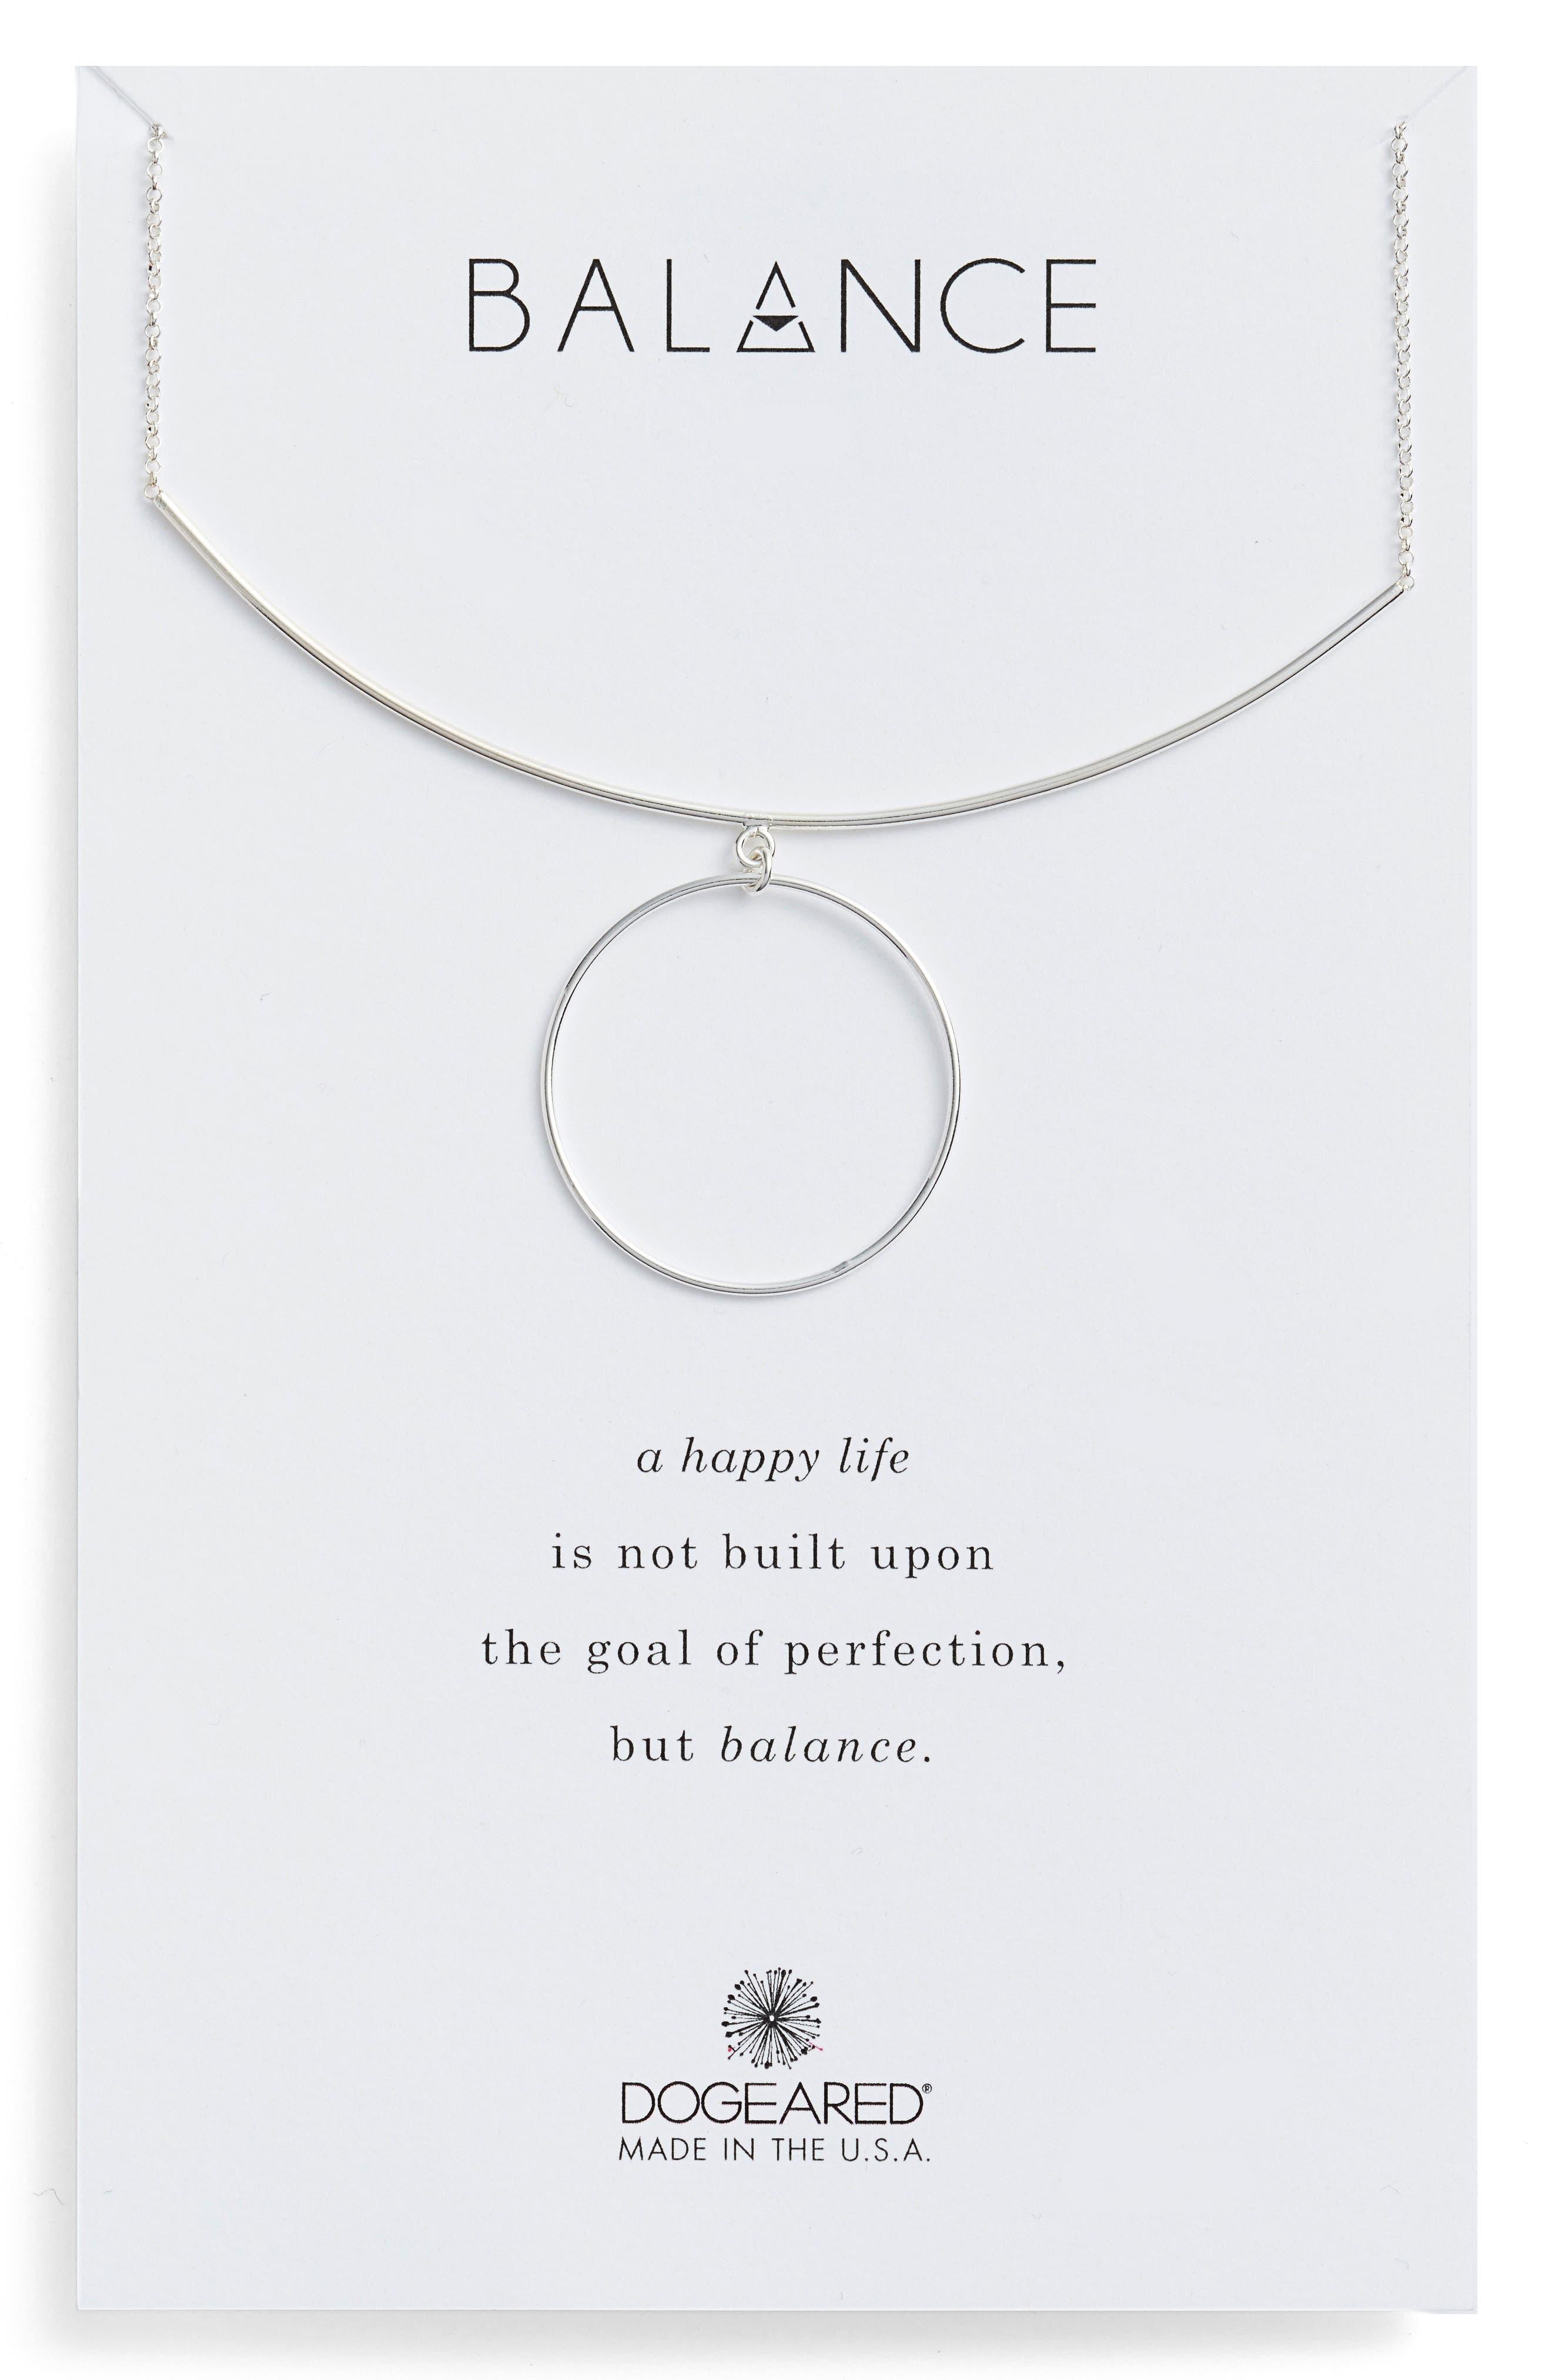 Balance Bar & Ring Pendant Necklace,                             Main thumbnail 1, color,                             040